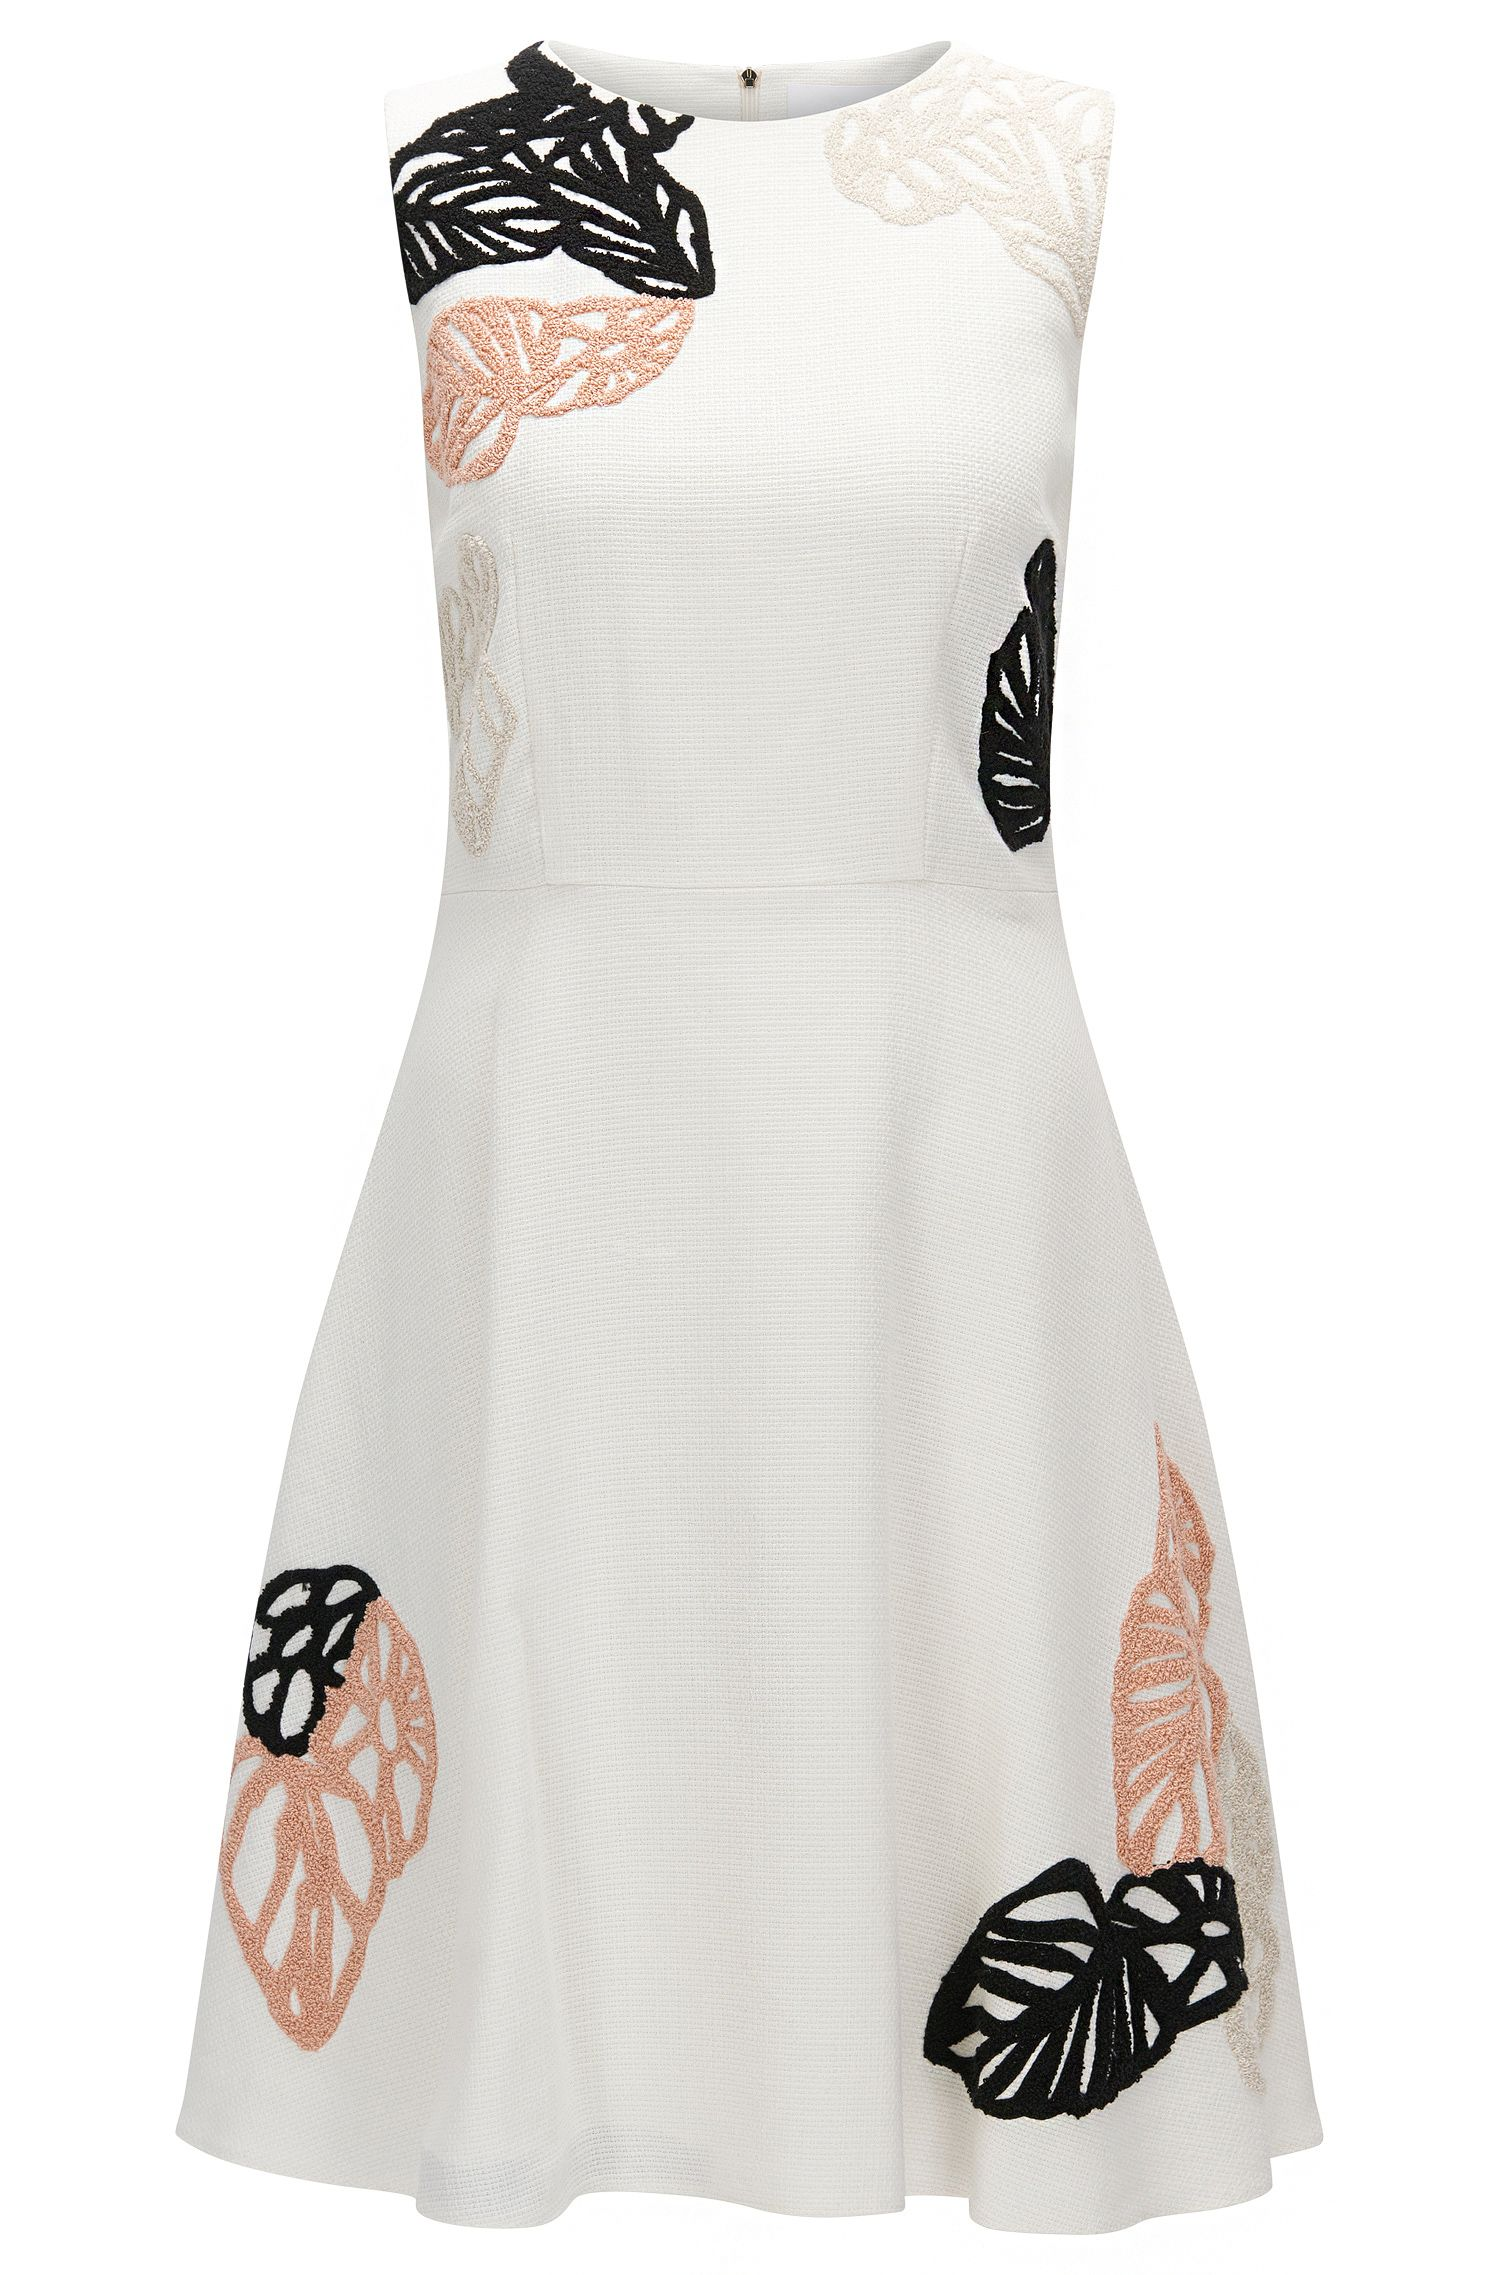 'Dyfera' | Cotton Blend Embroidered Dress